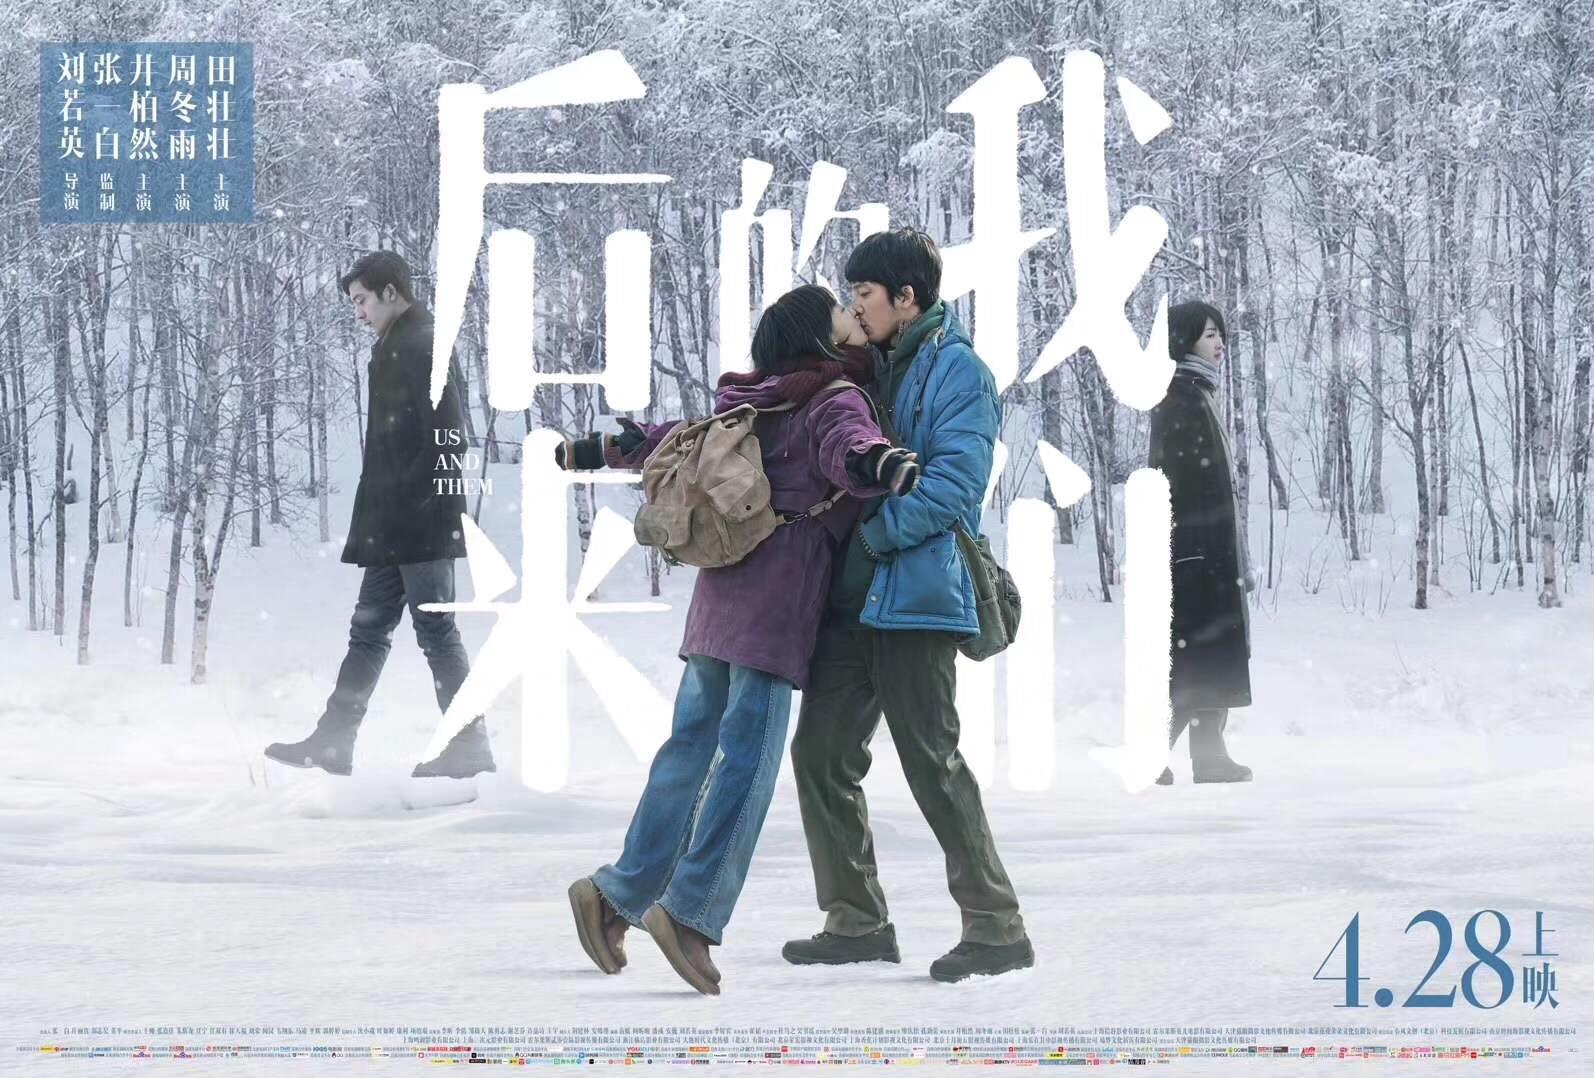 Movie, 后来的我们(中國, 2018年) / 後來的我們(台灣) / Us and Them(英文), 電影海報, 中國, 橫版